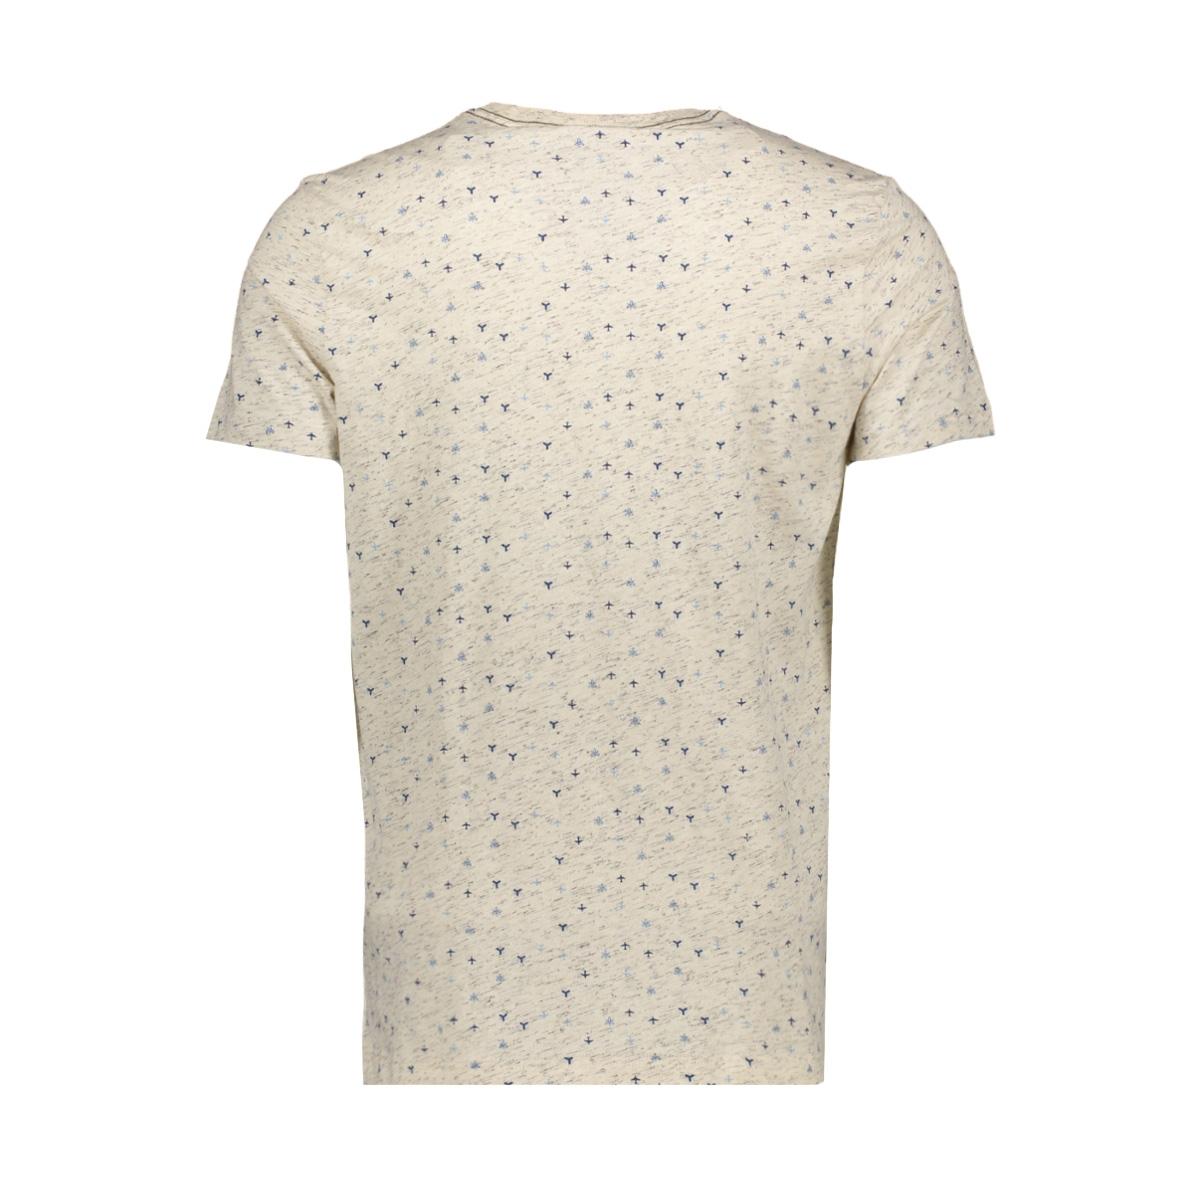 ptss191552 pme legend t-shirt 7013